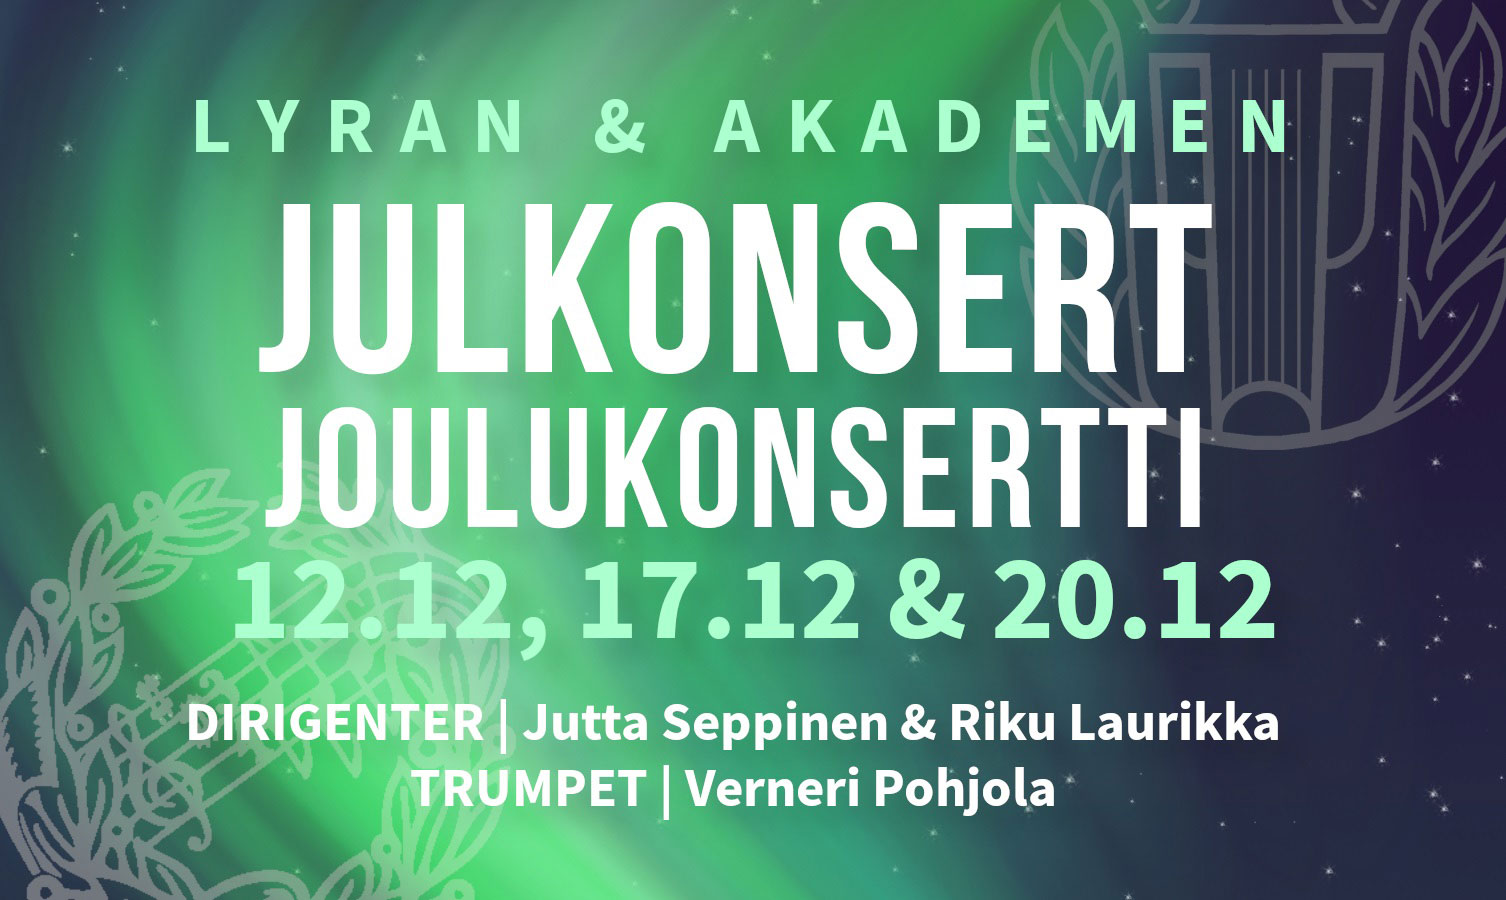 Link to event Christmas Concert with Lyran and Akademen